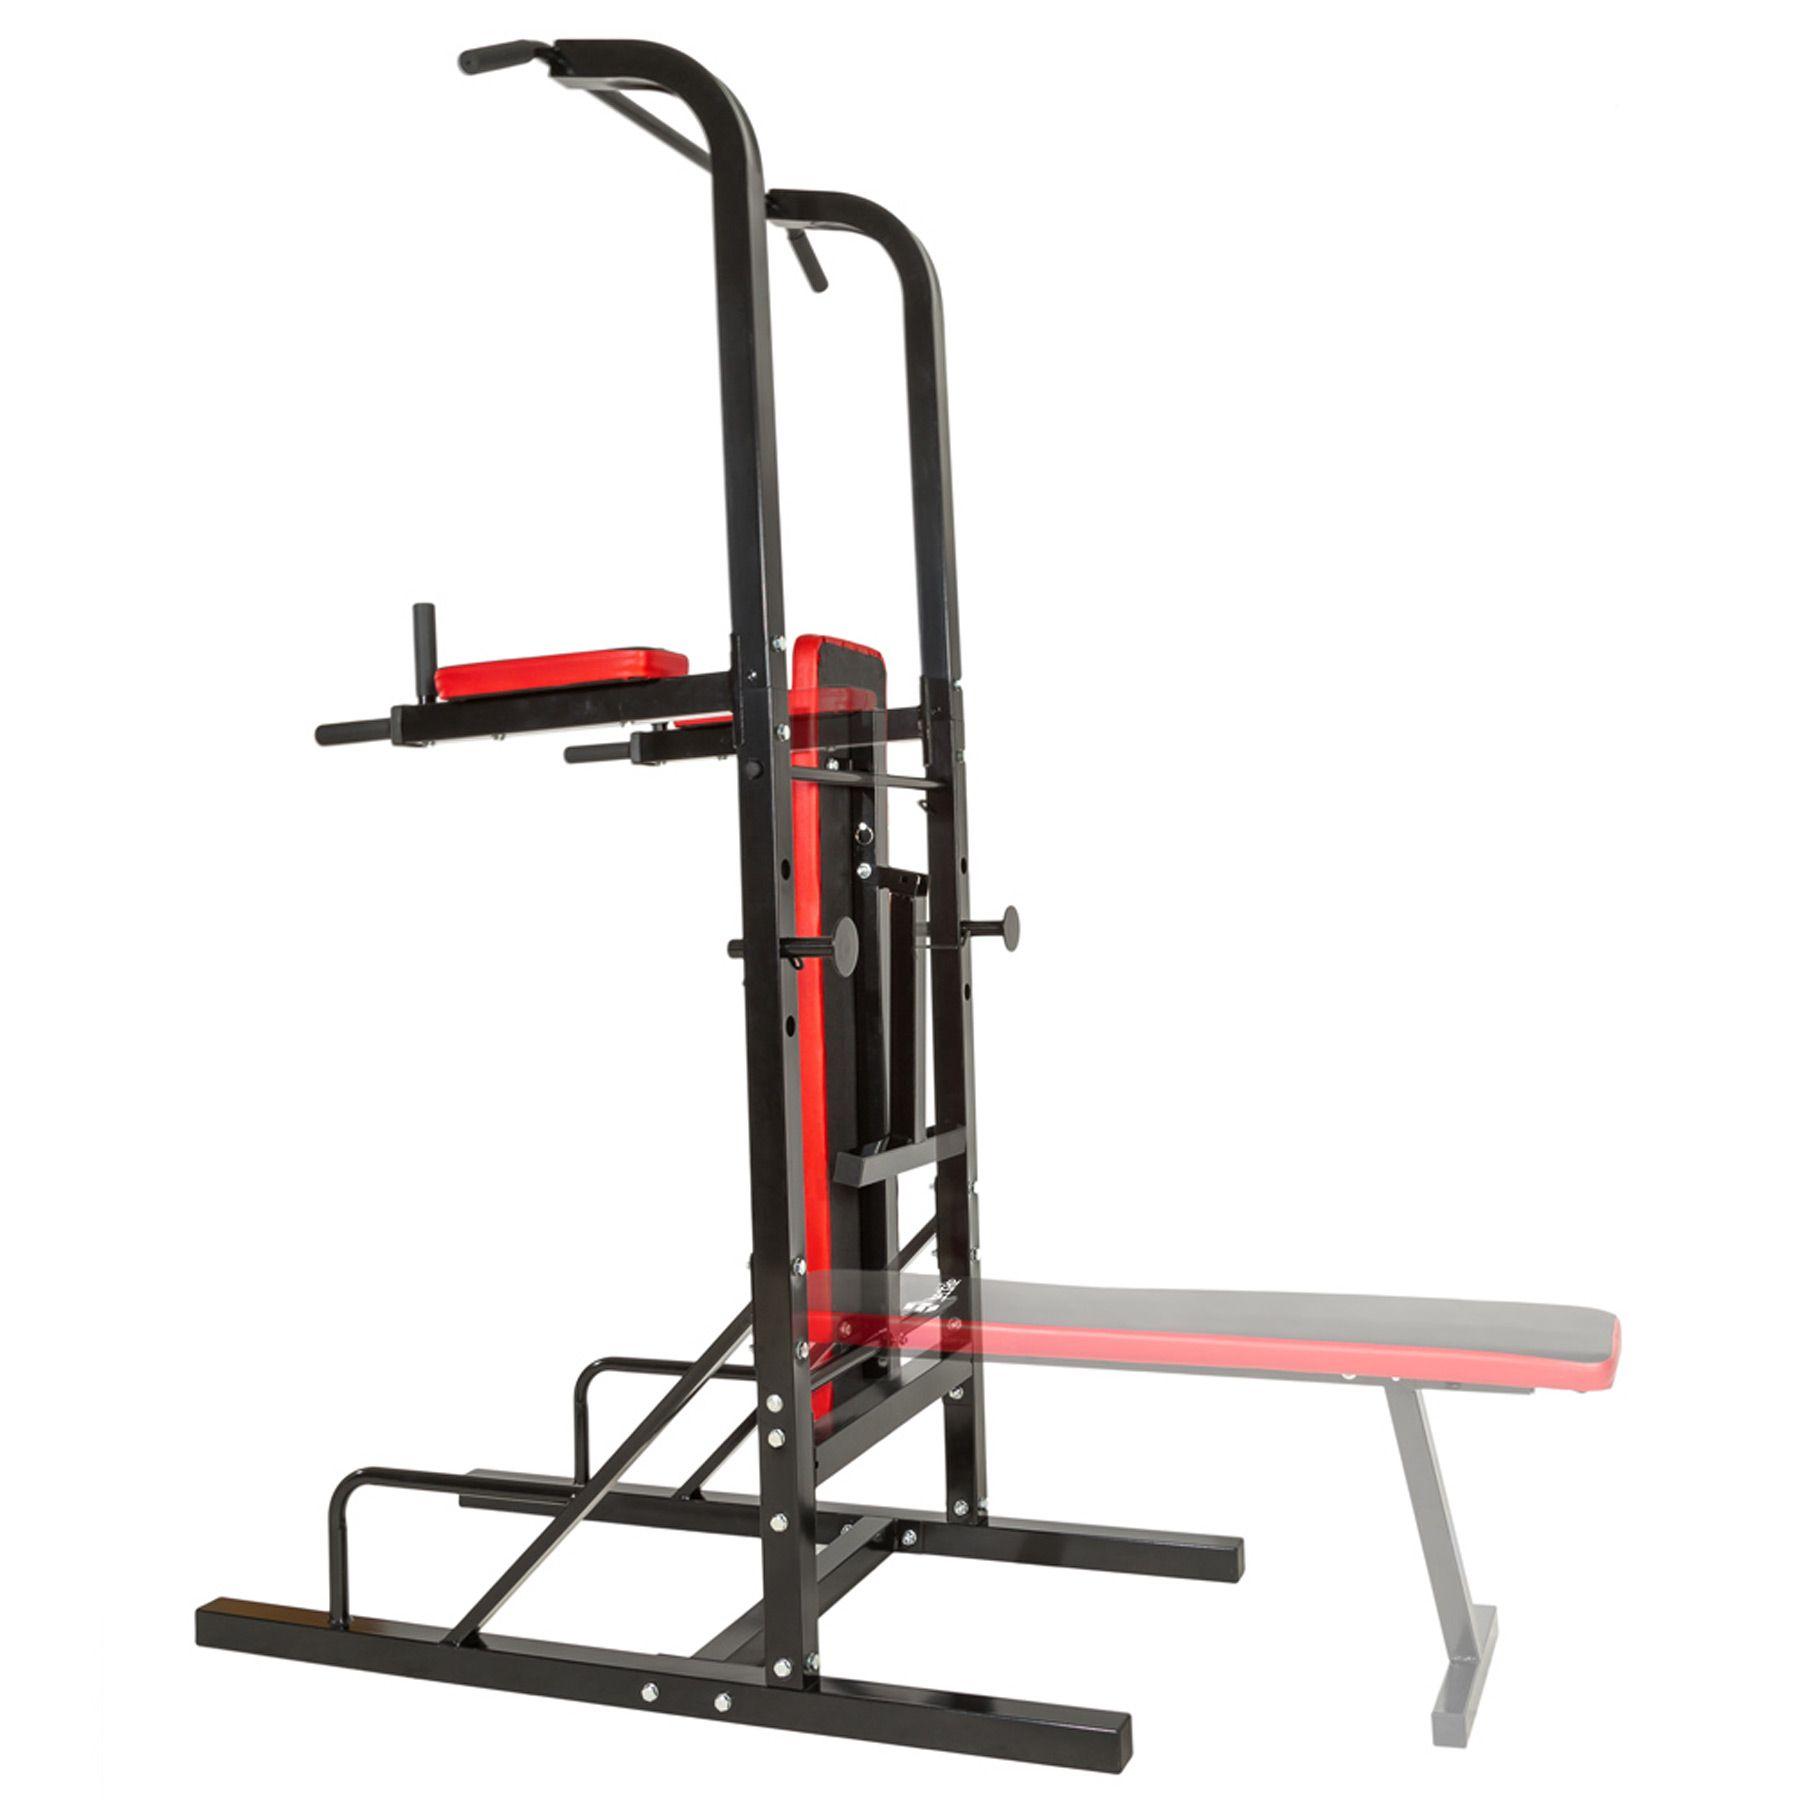 Station De Musculation Banc Multifonction Fitness Dips Barre